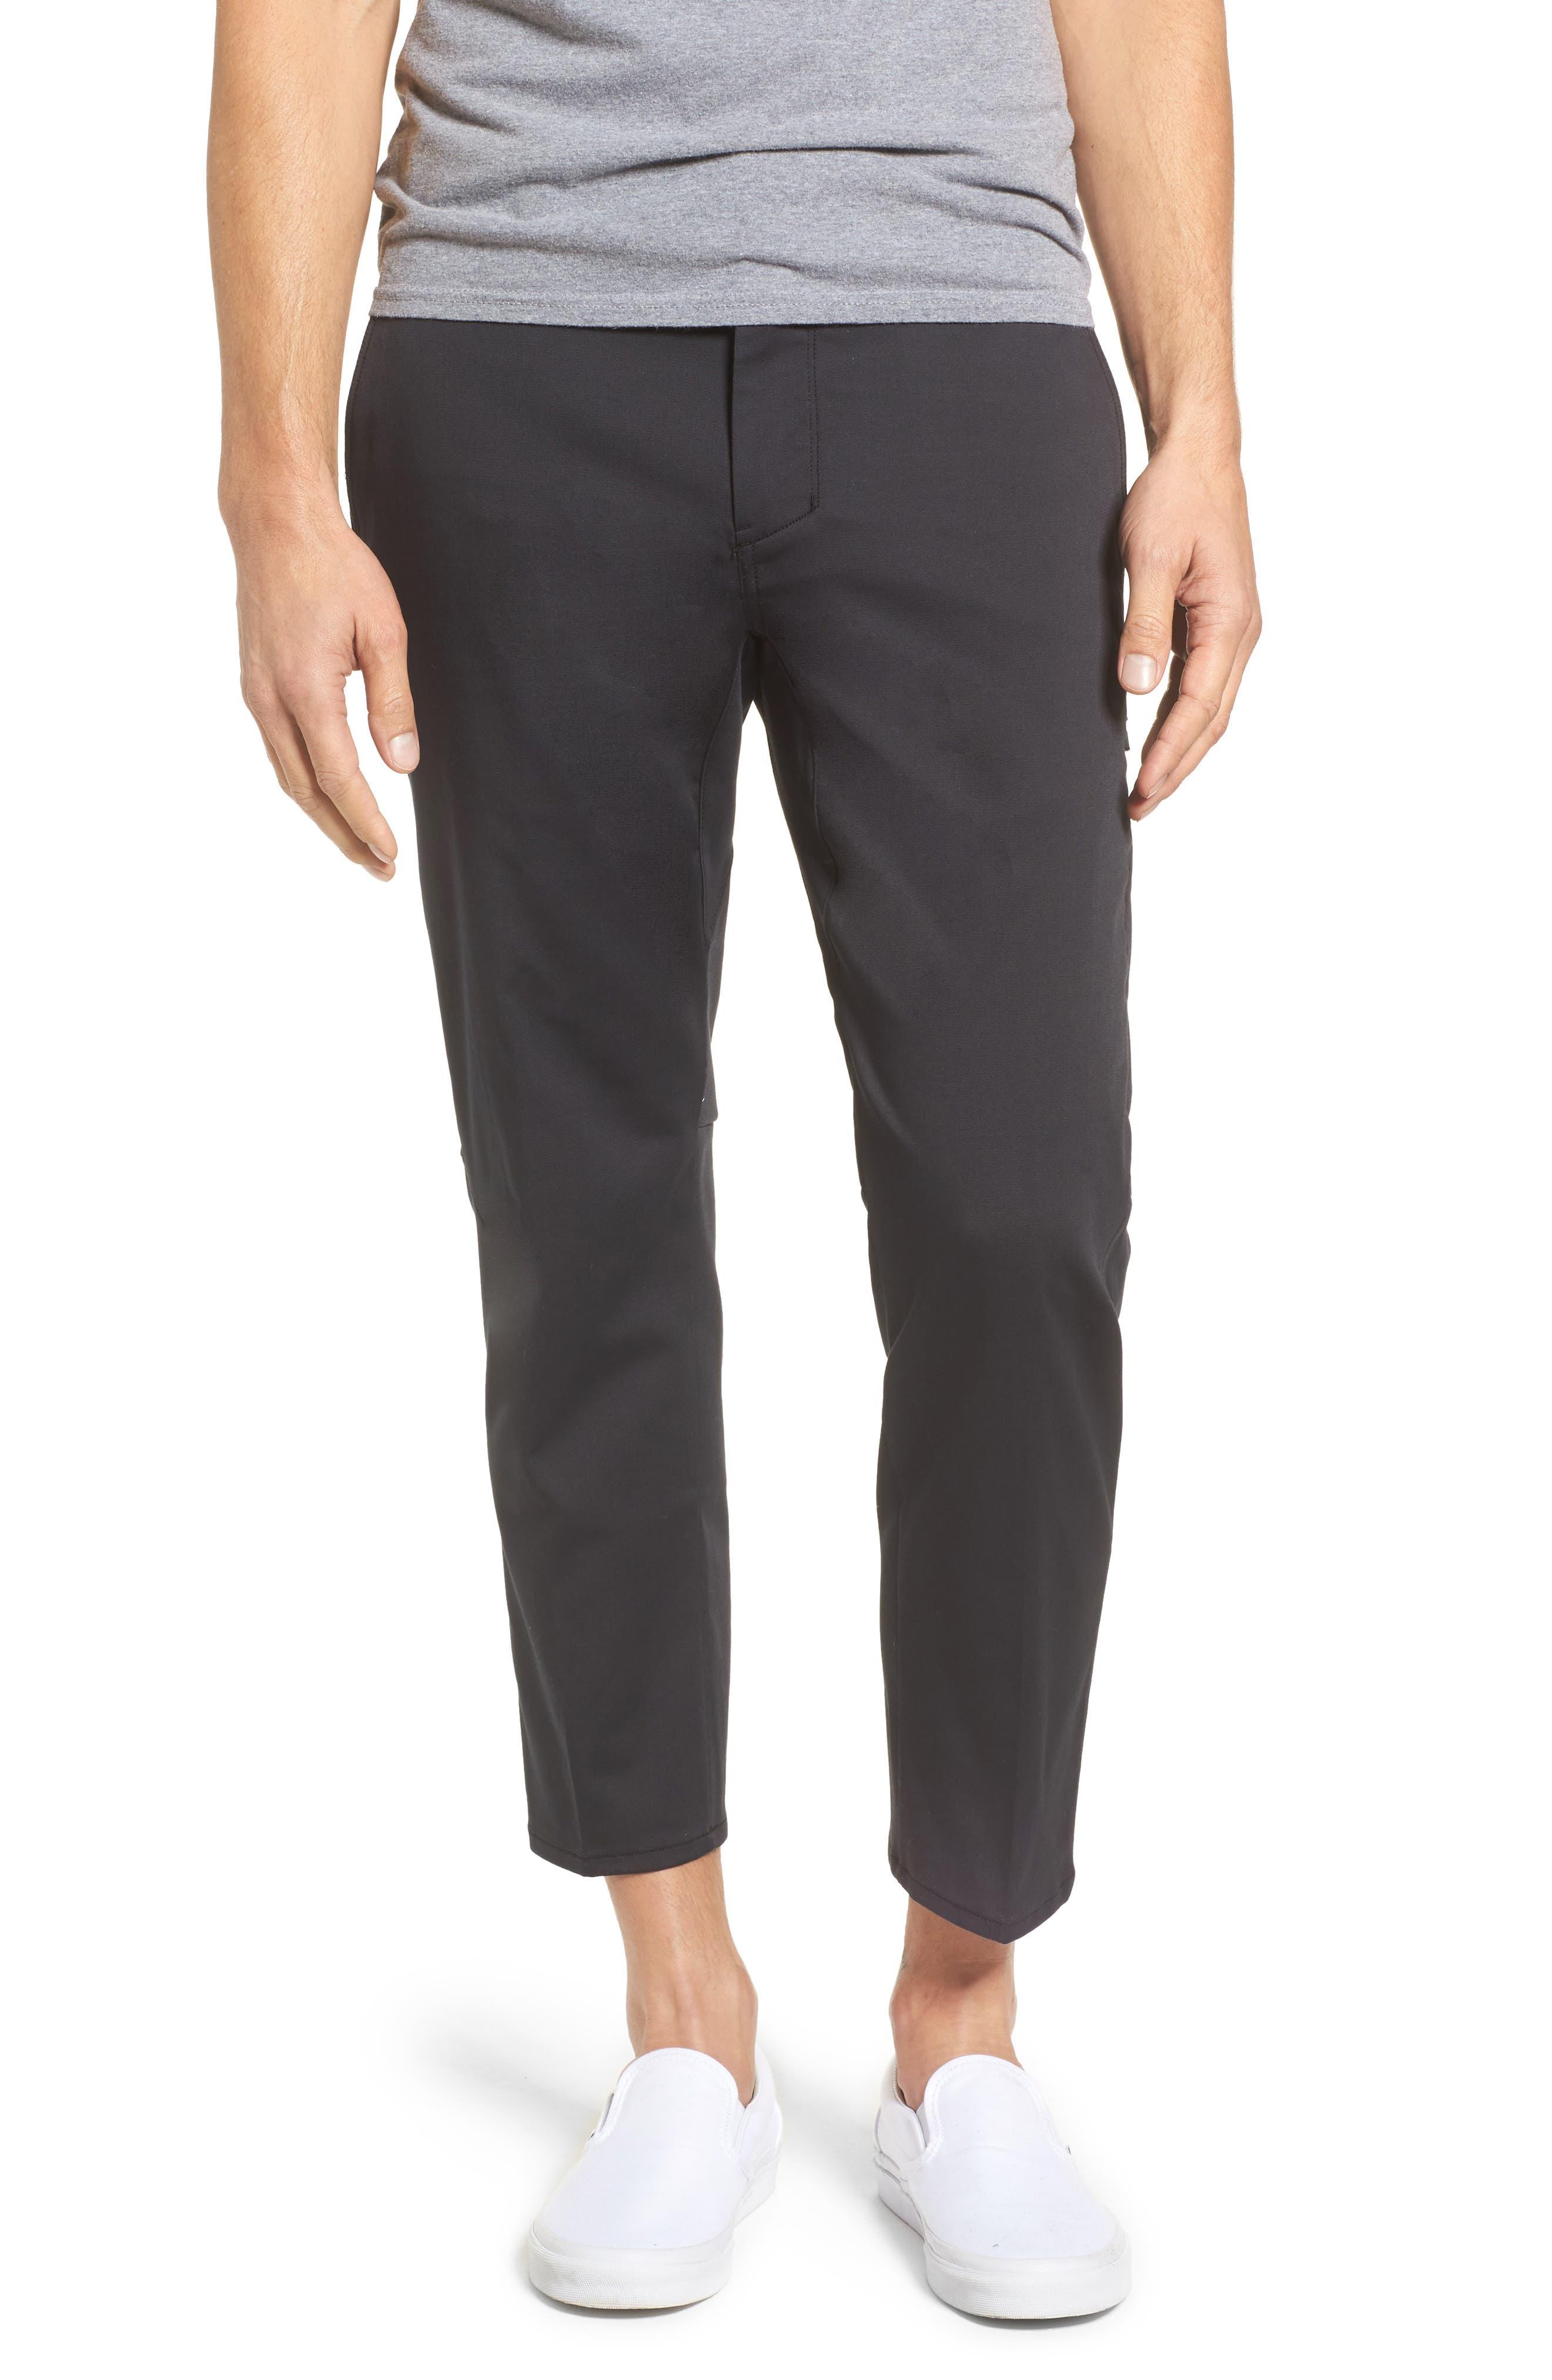 Covert Slim Fit Crop Pants,                             Main thumbnail 1, color,                             Black